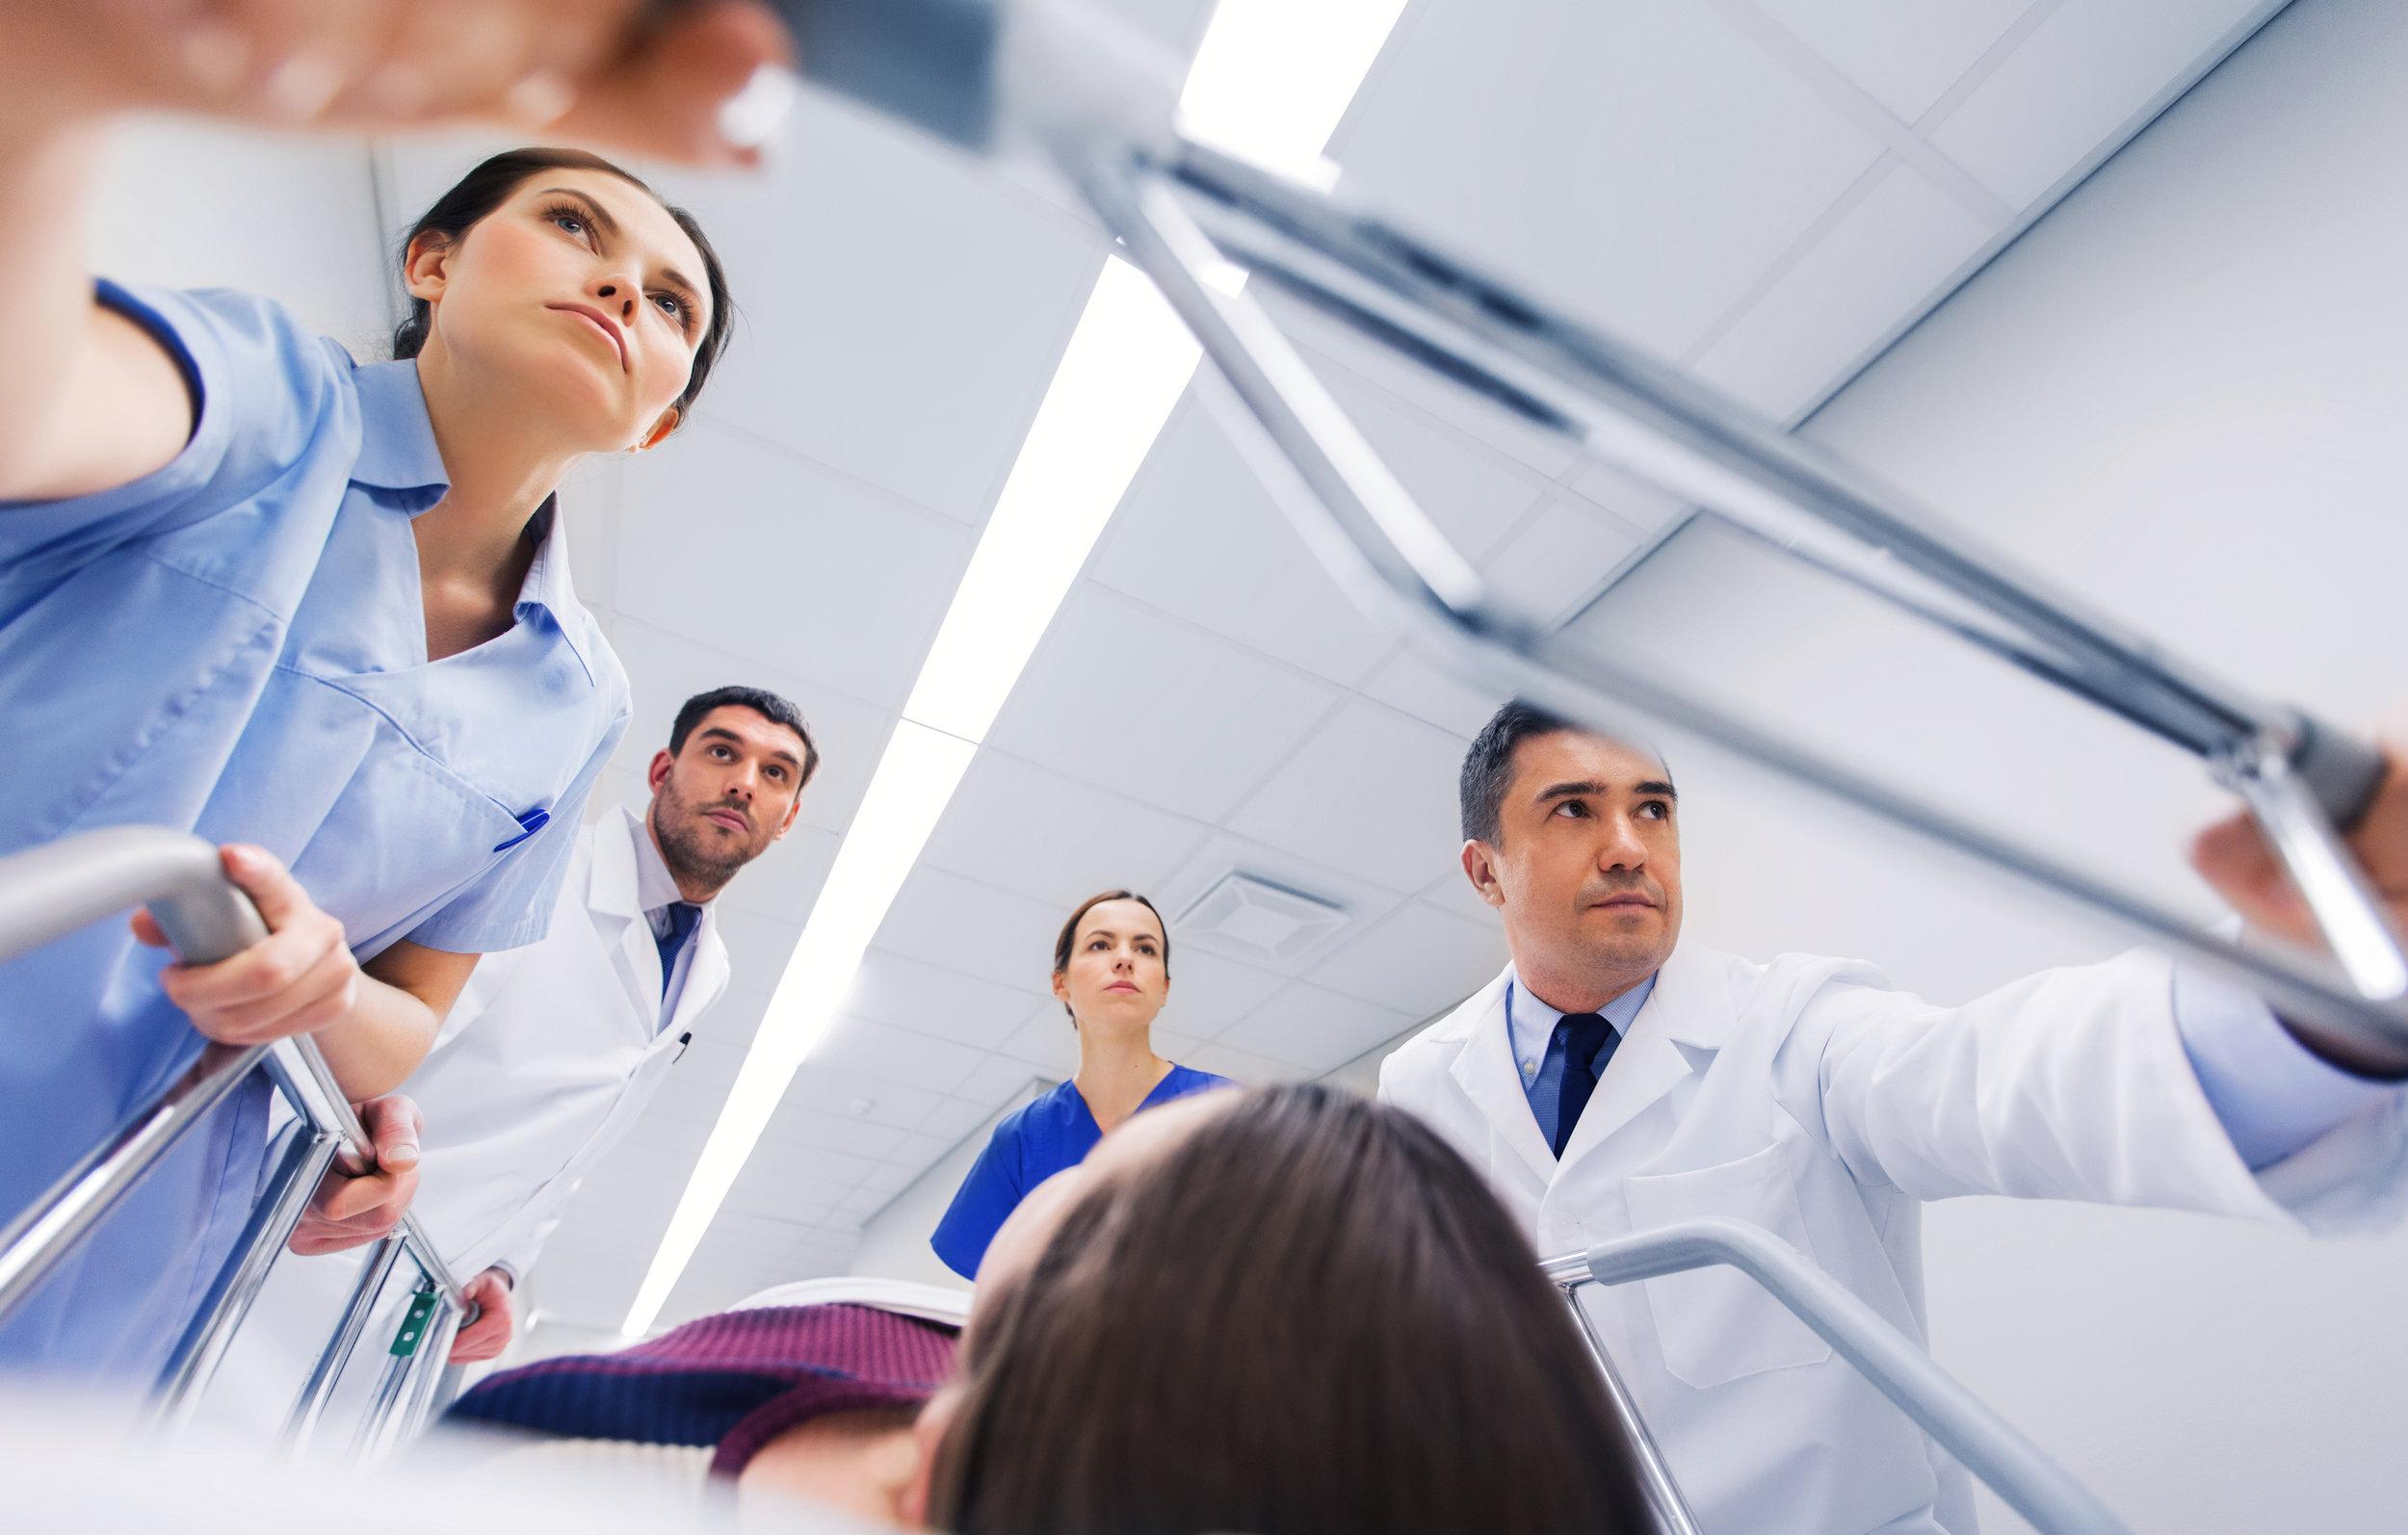 medics-with-woman-on-hospital-gurney-at-emergency-PFY8TVD.jpg